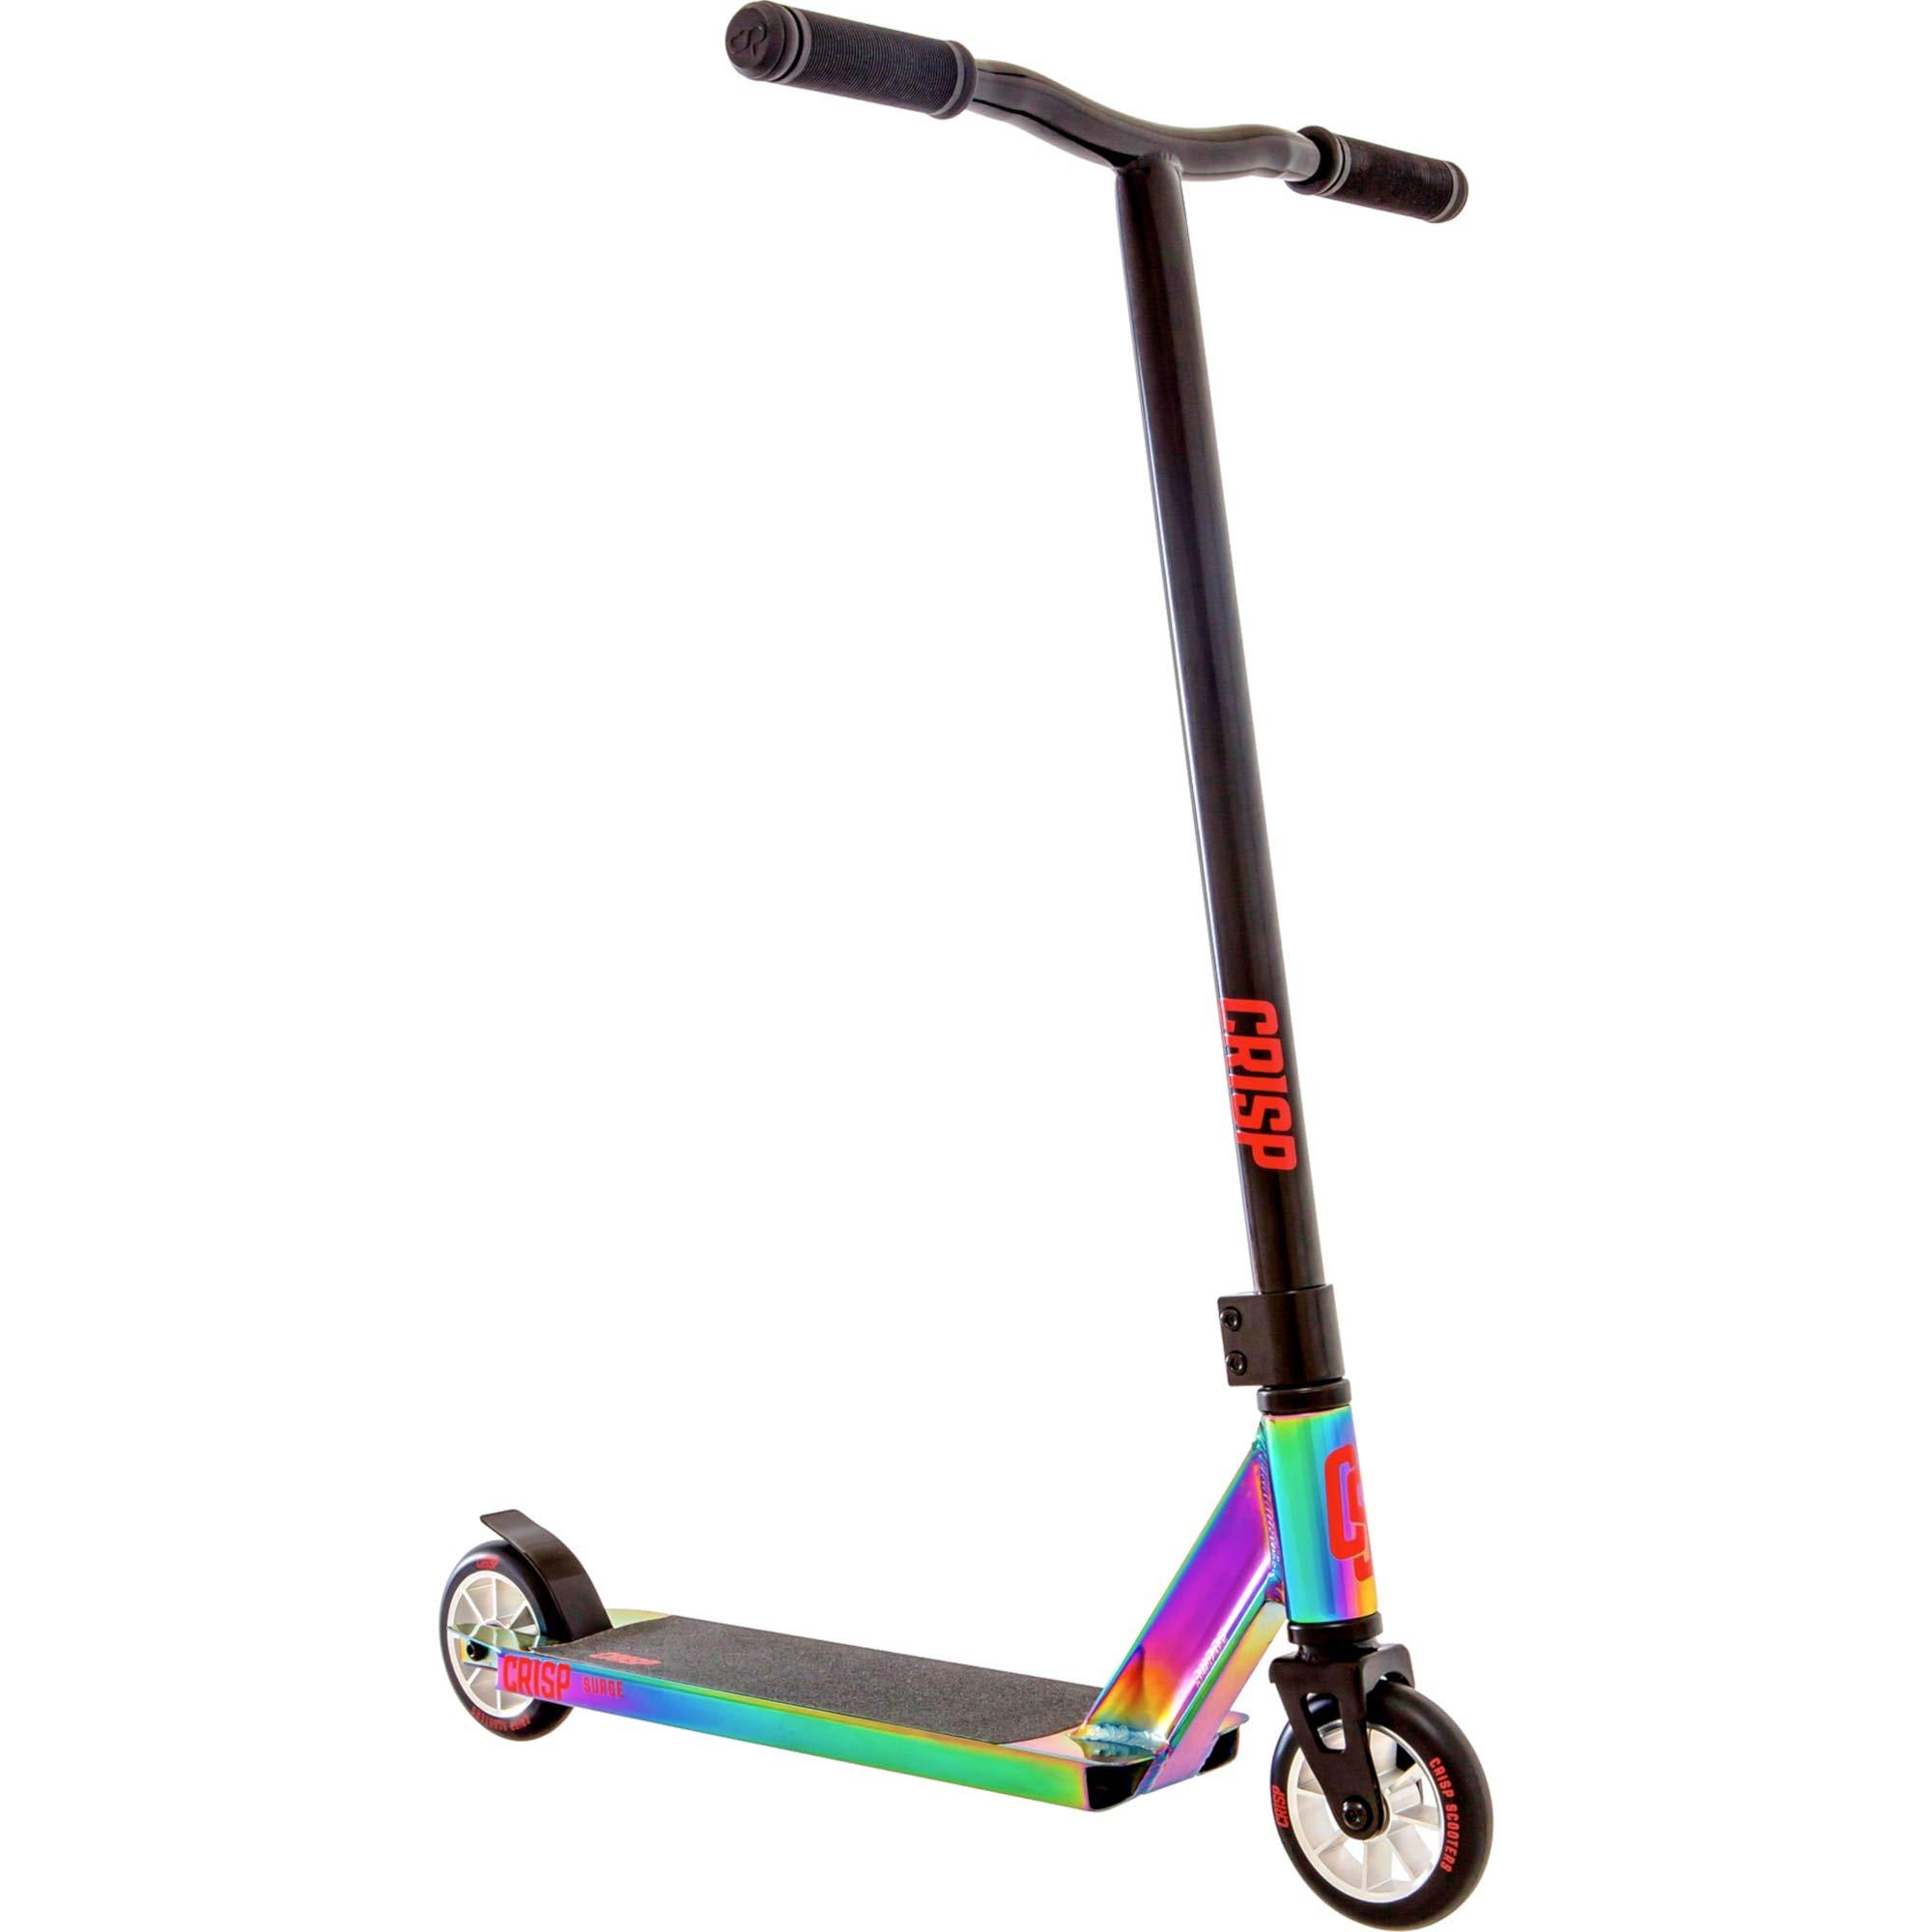 Crisp Surge Pro Scooter (Neo/Black) by Crisp Scooters